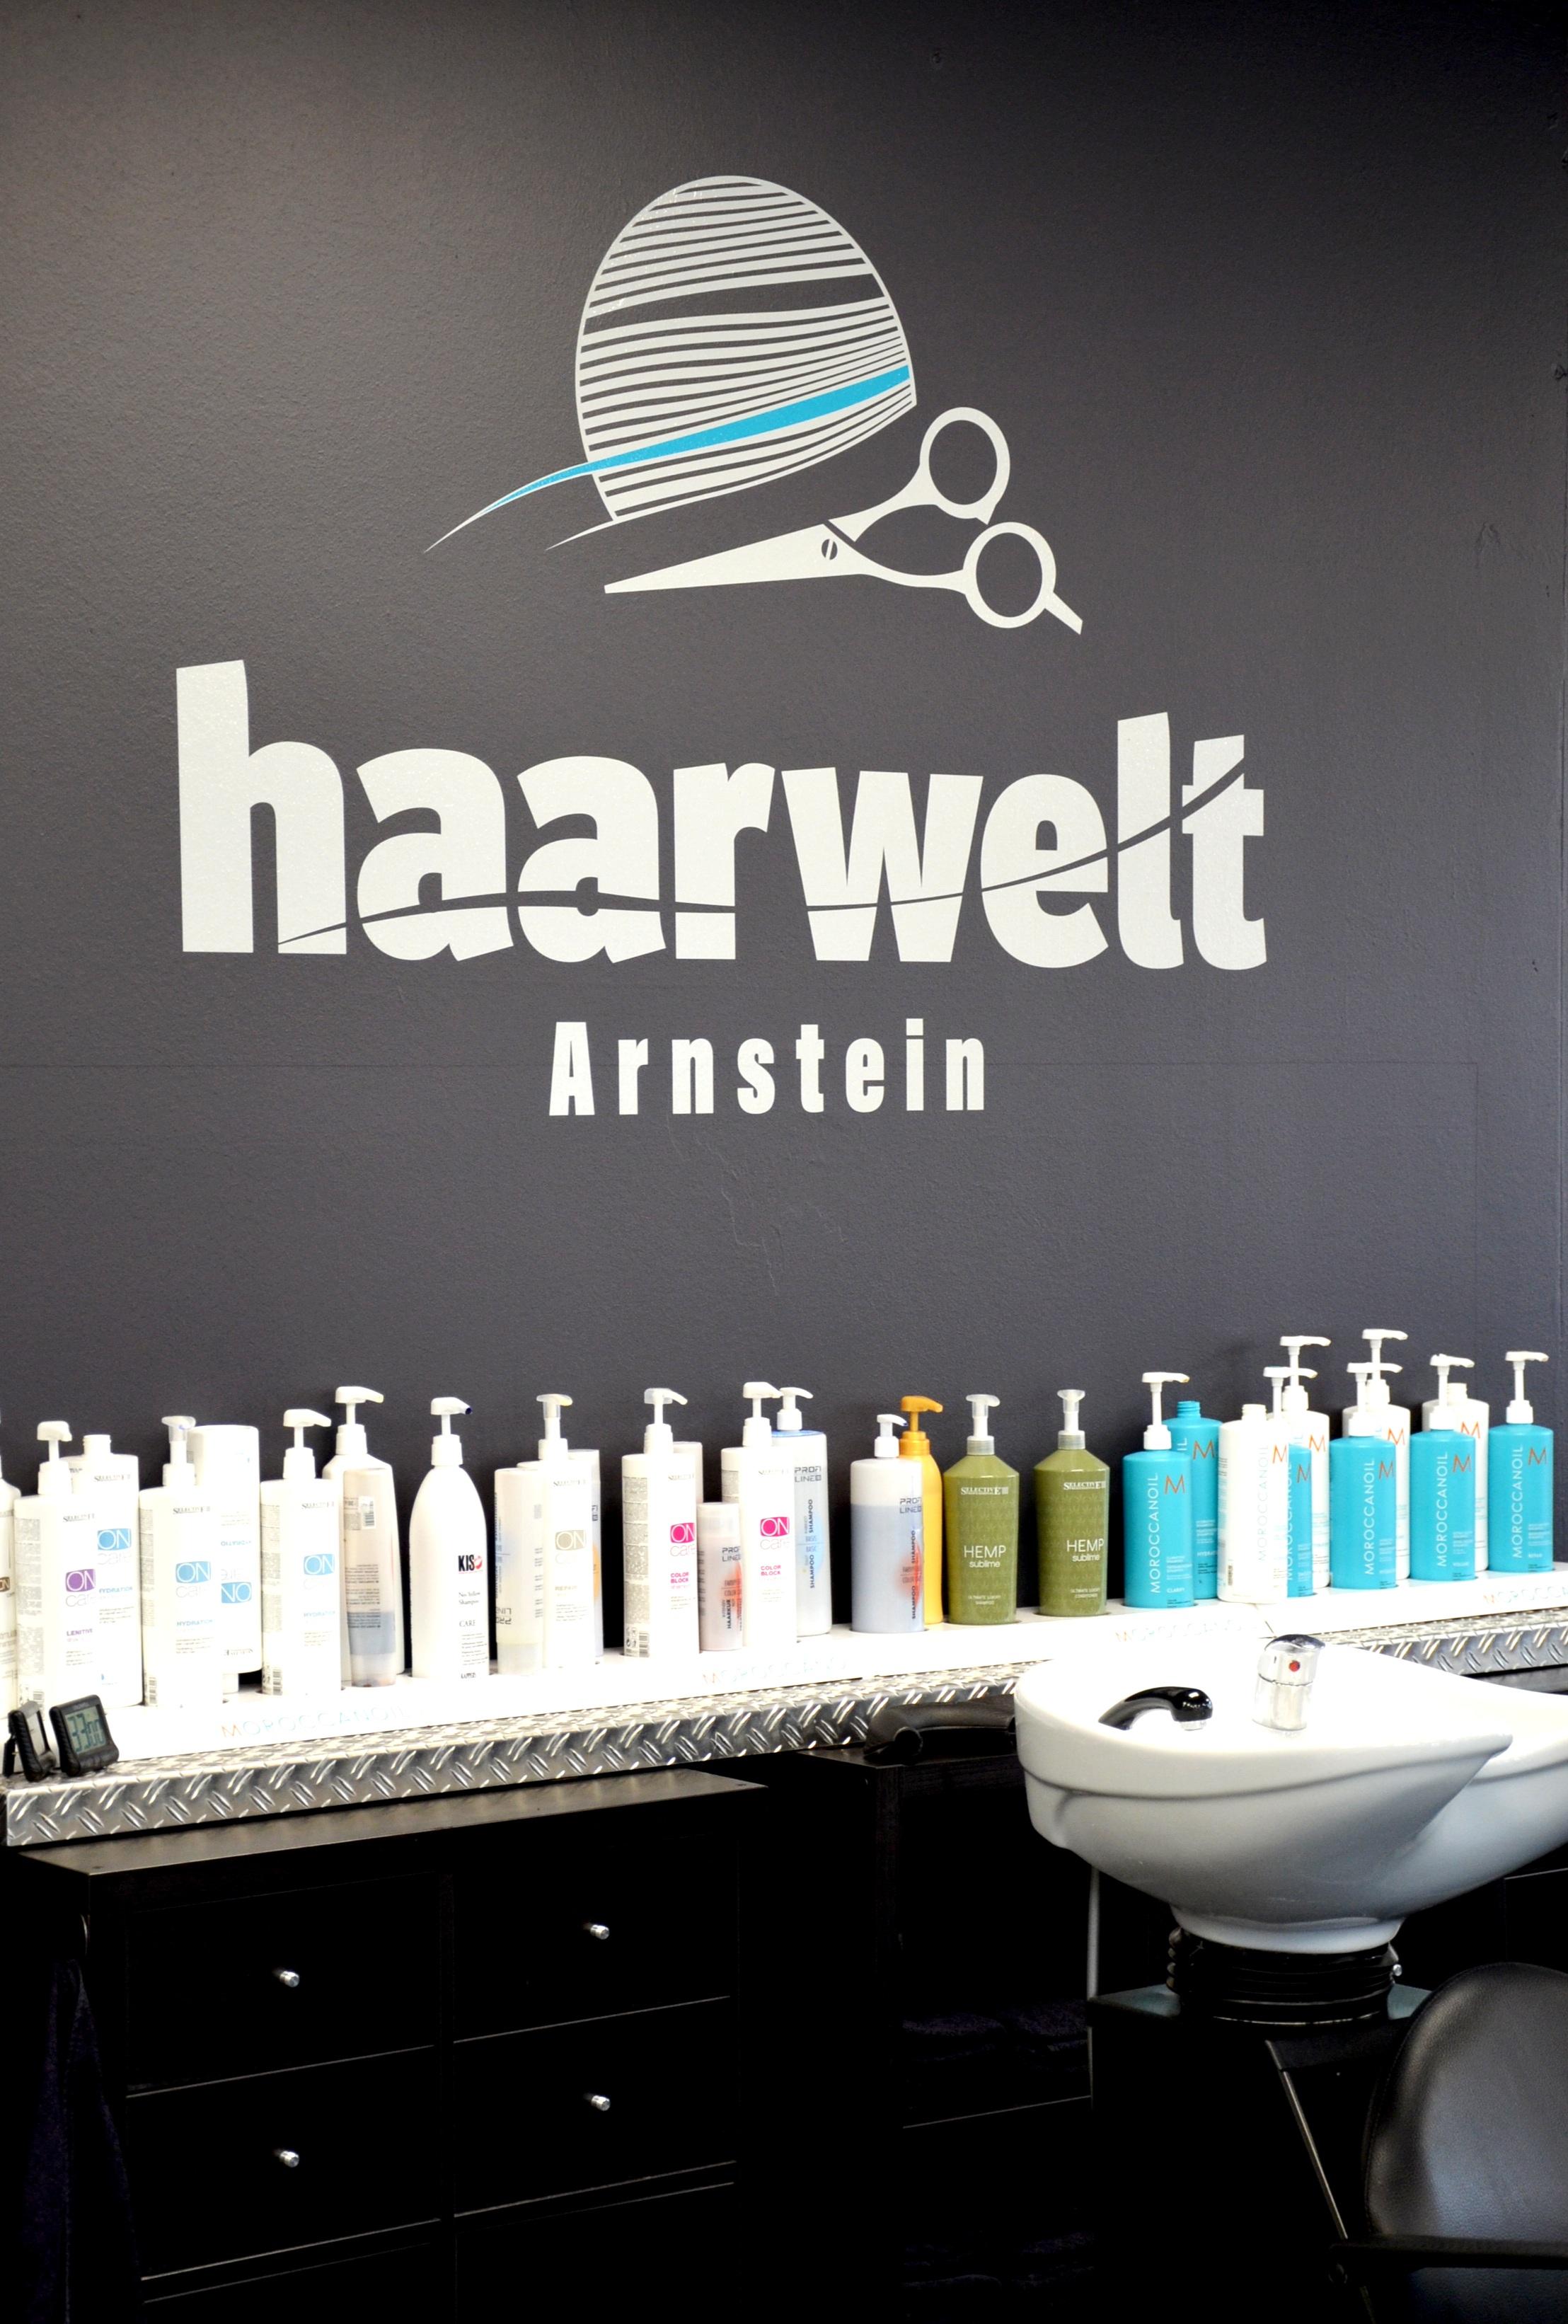 Haarwelt-Friseur-Arnstein_Studio_Michael_Seidl_Design1.JPG